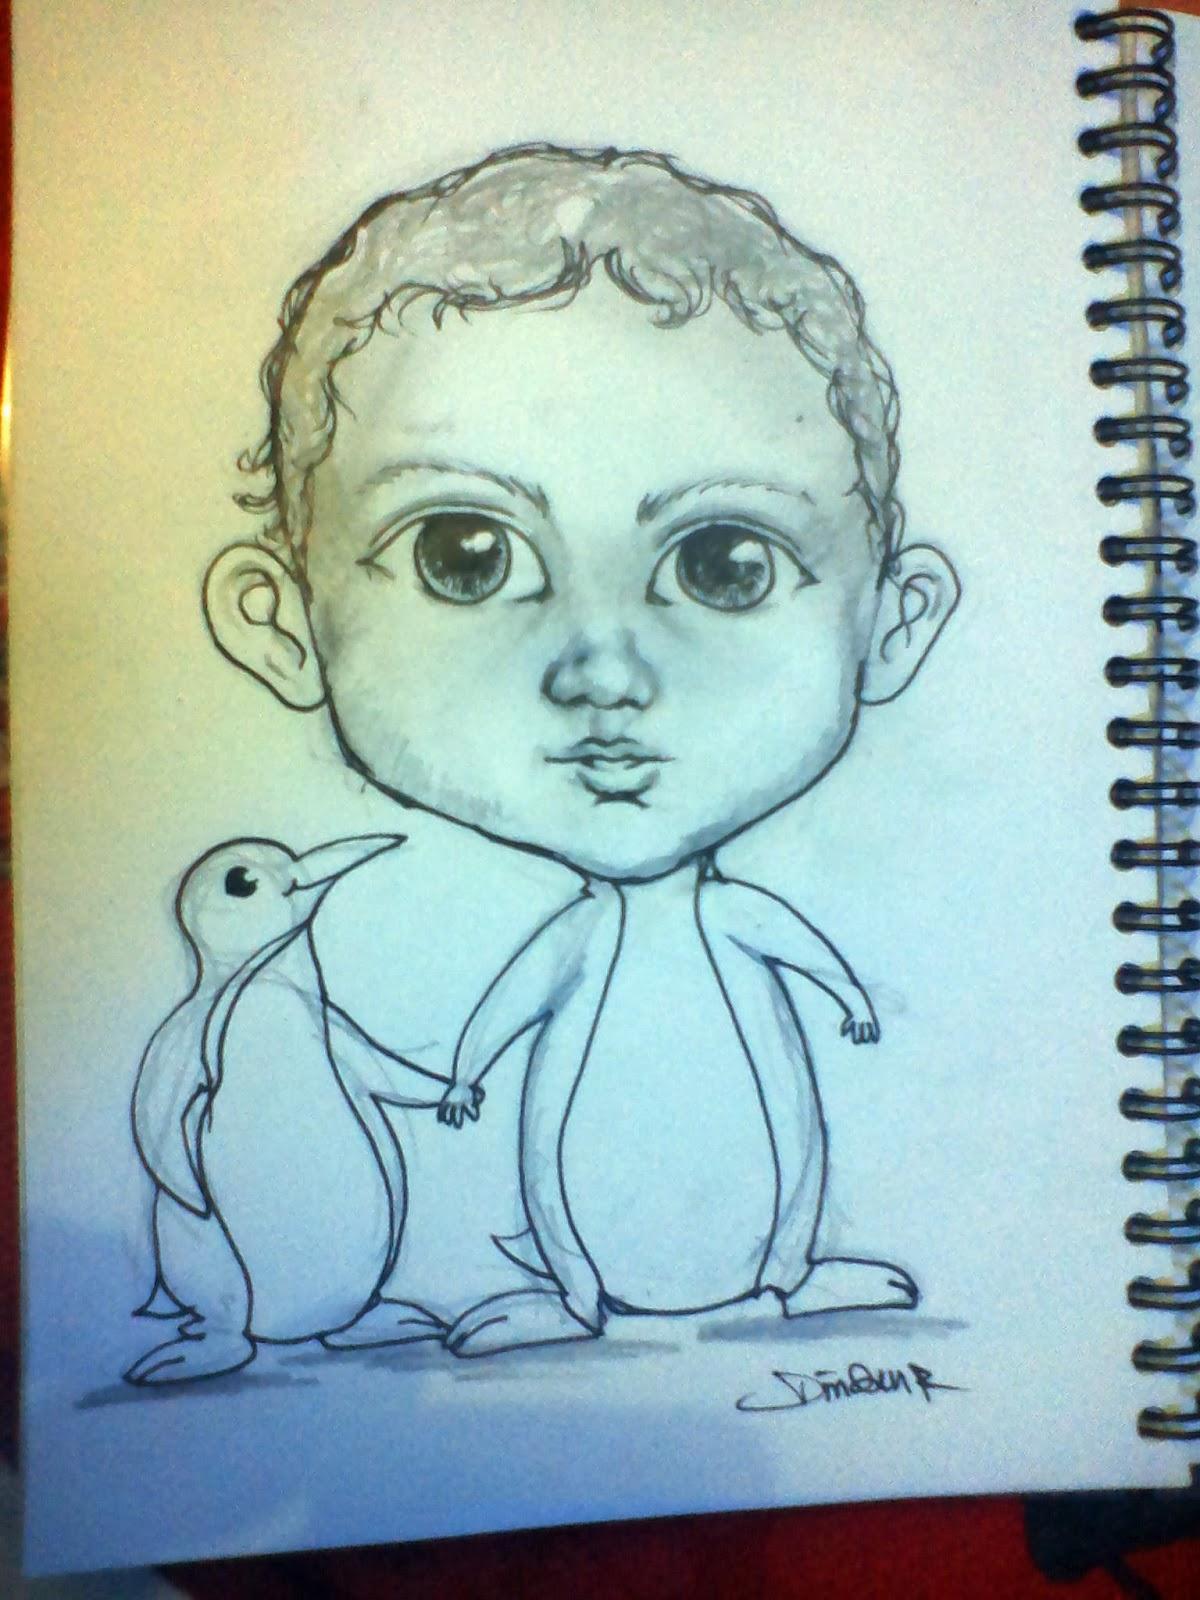 Dinsnusantara Tutorial Ilustrasi Karikatur Wajah Anak Lucu